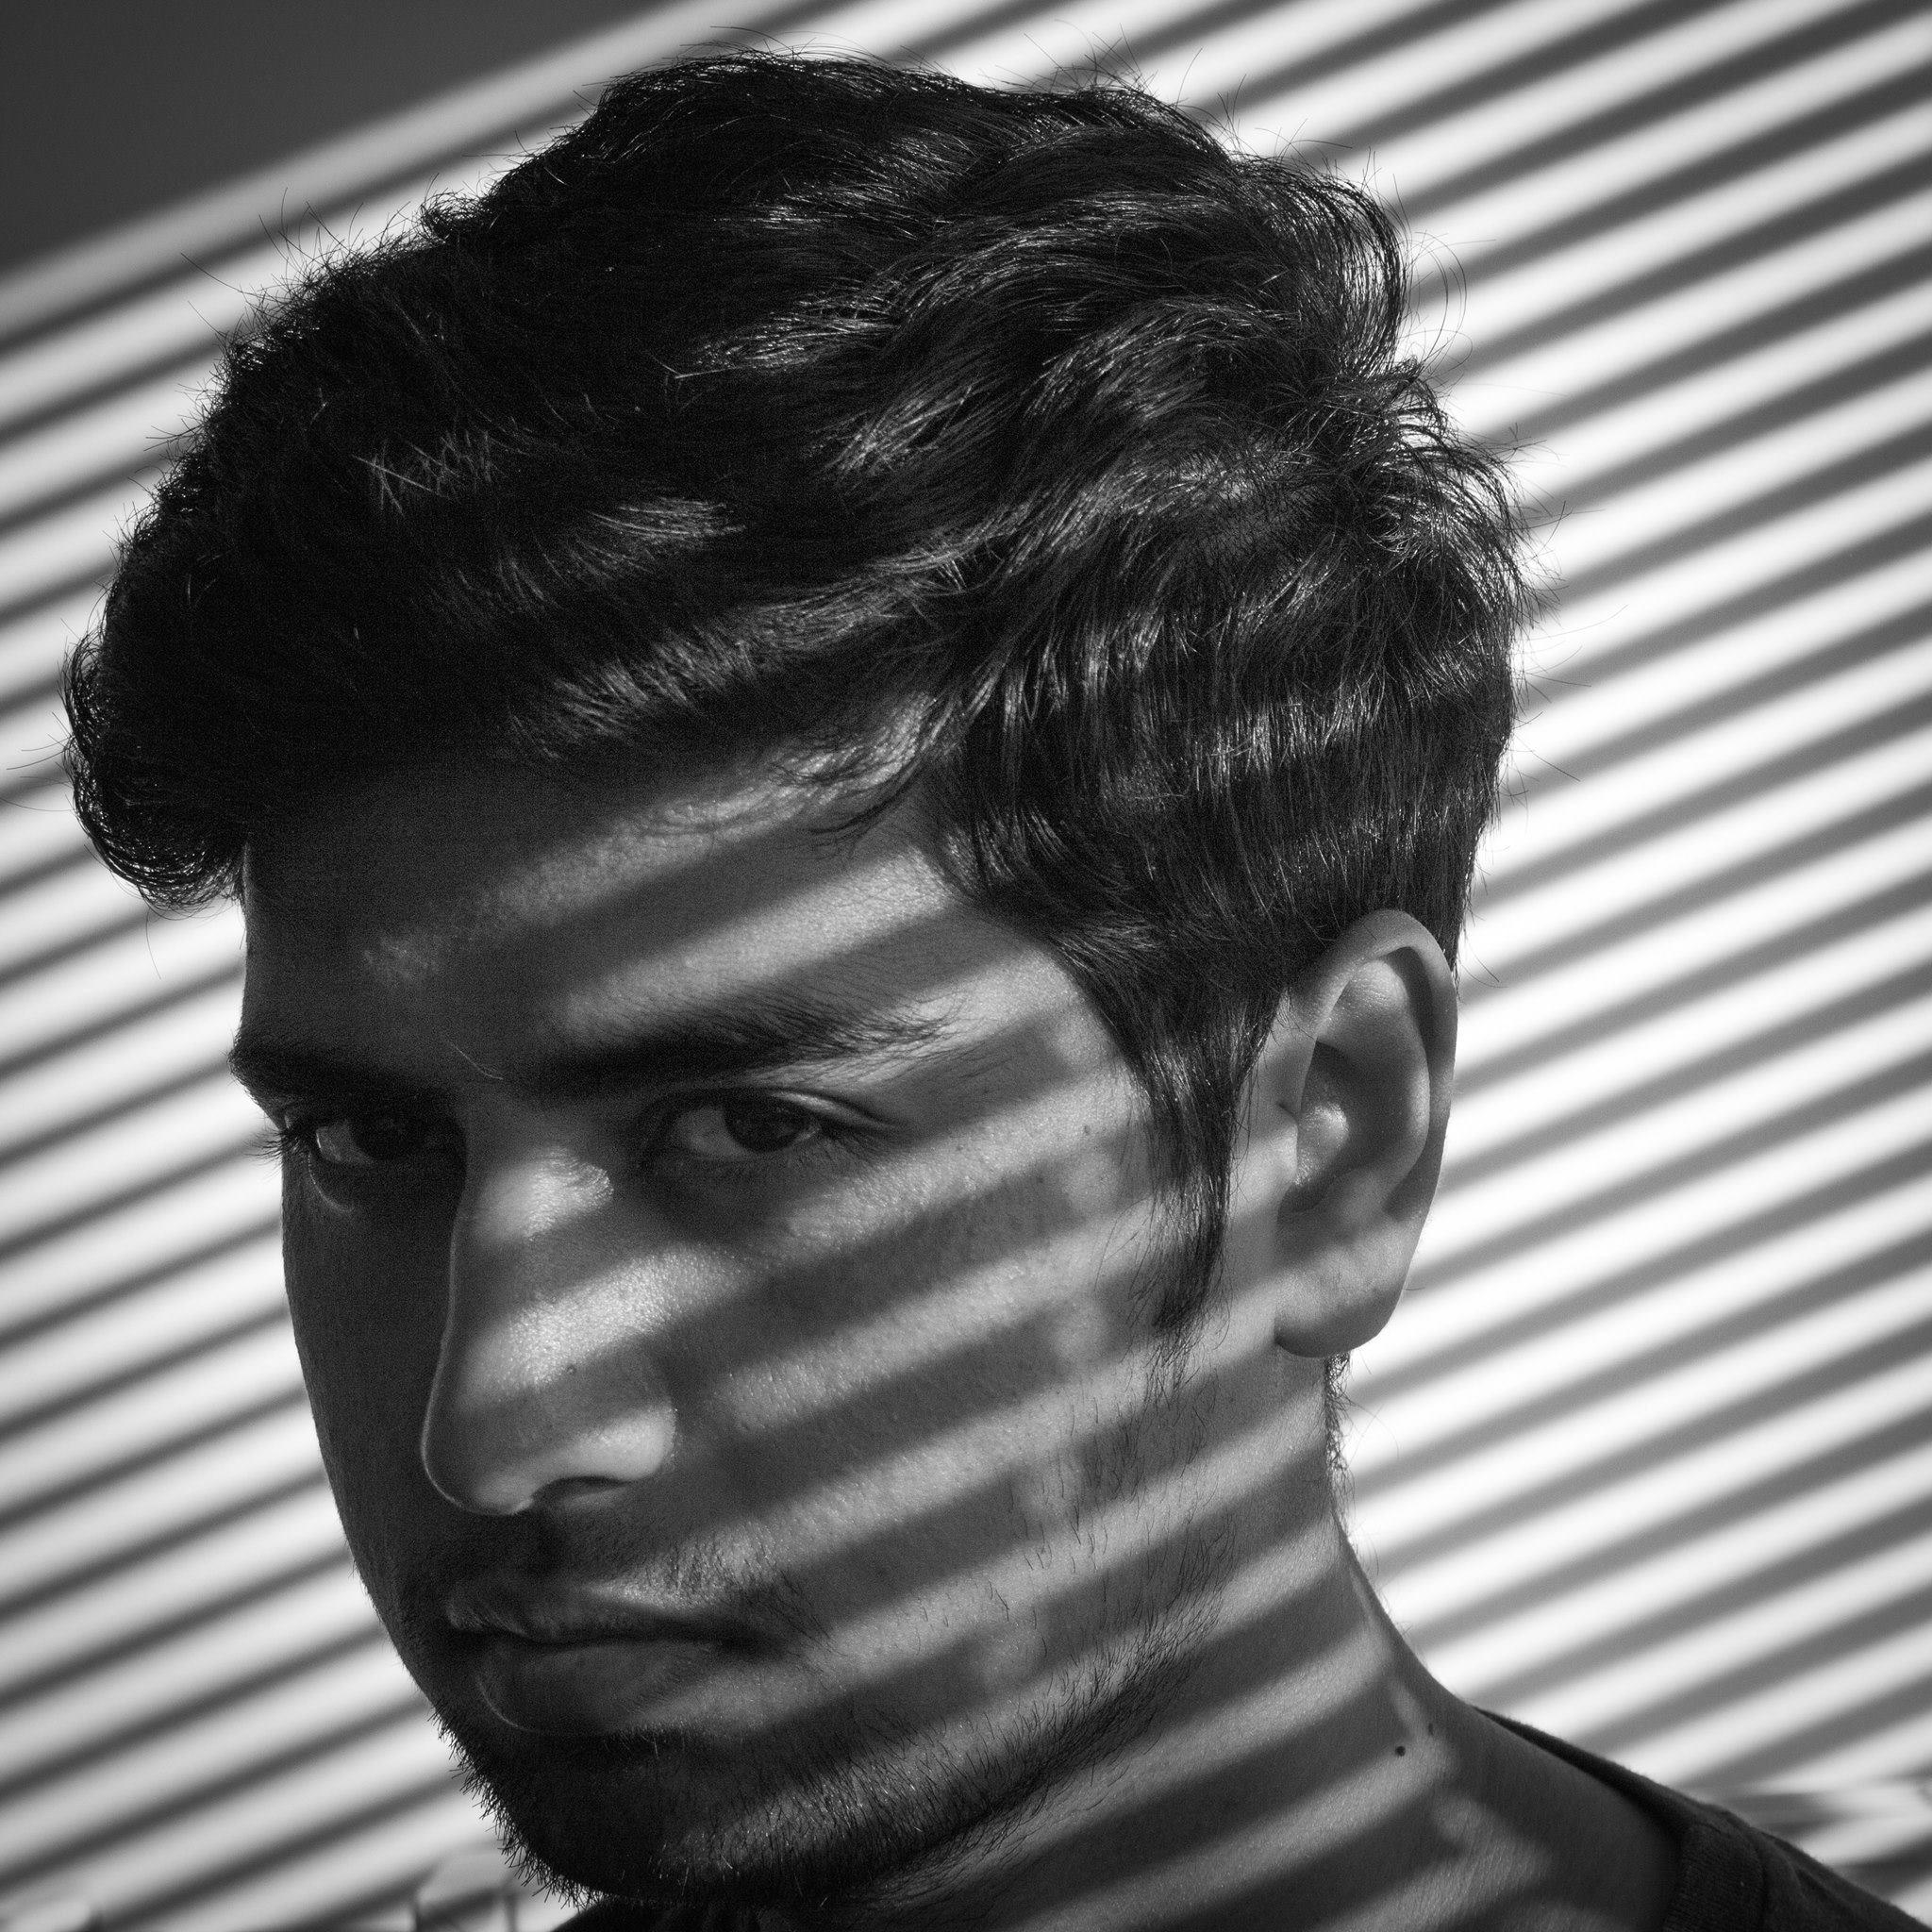 Go to Siddhant Kumar's profile